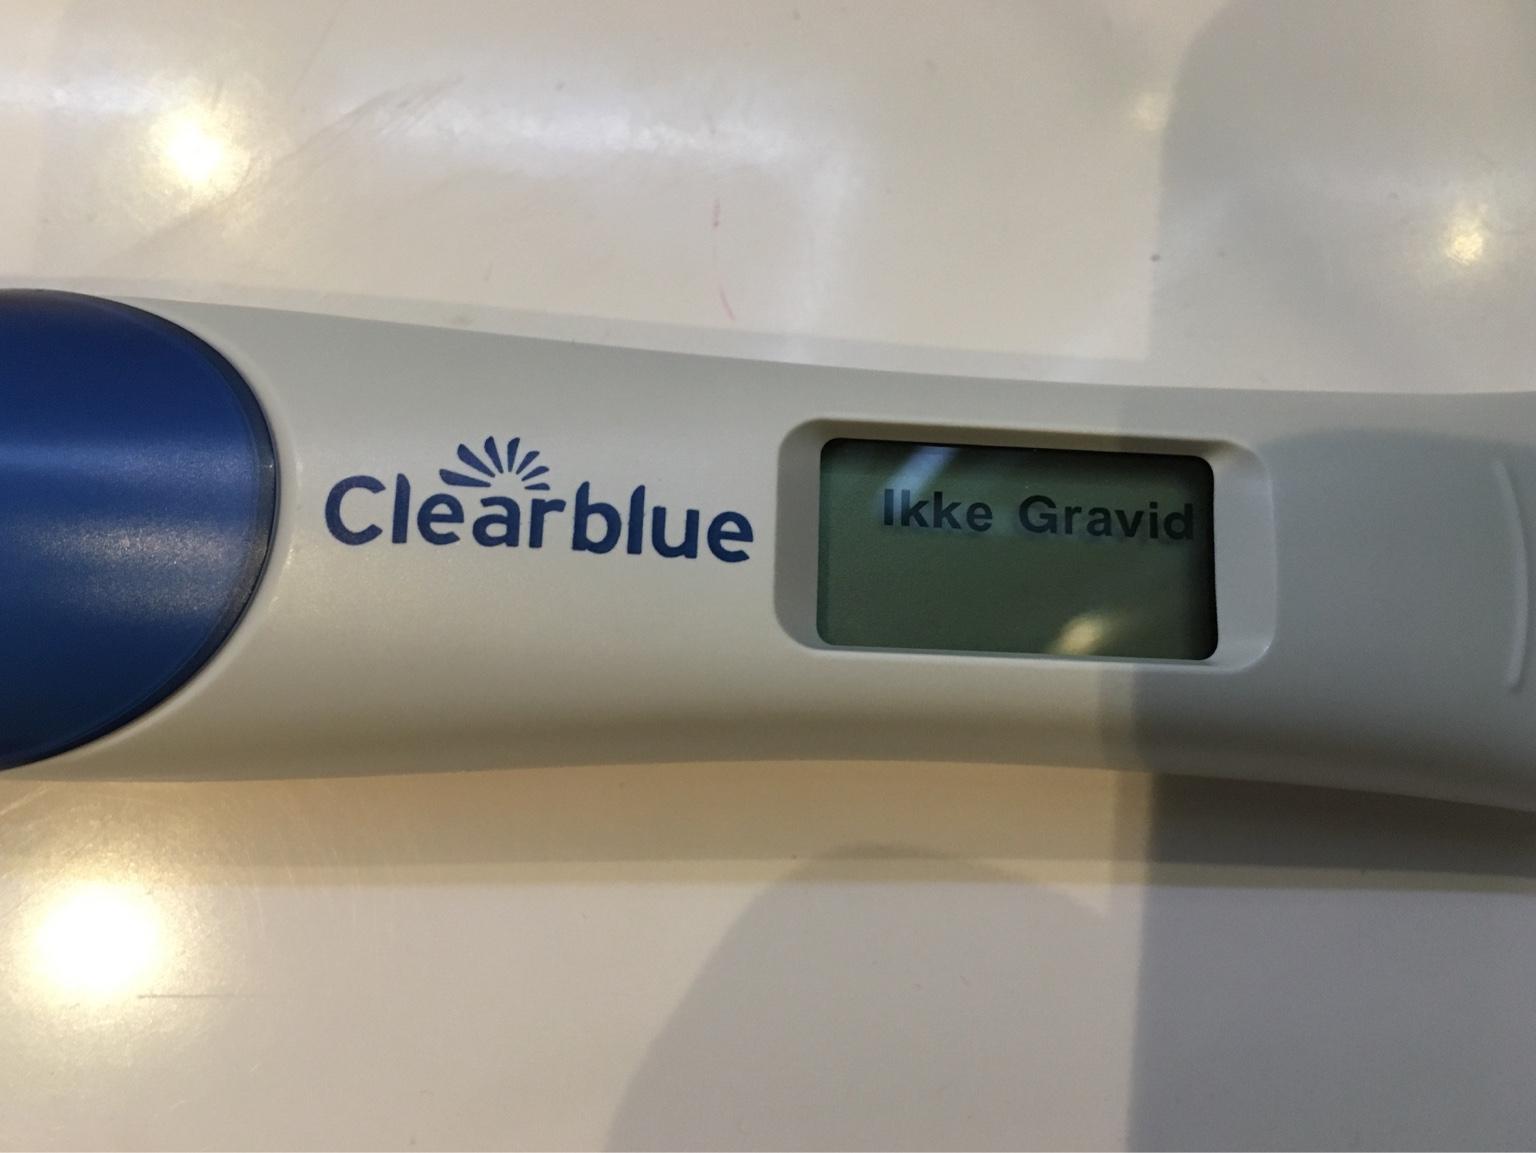 ikke gravid